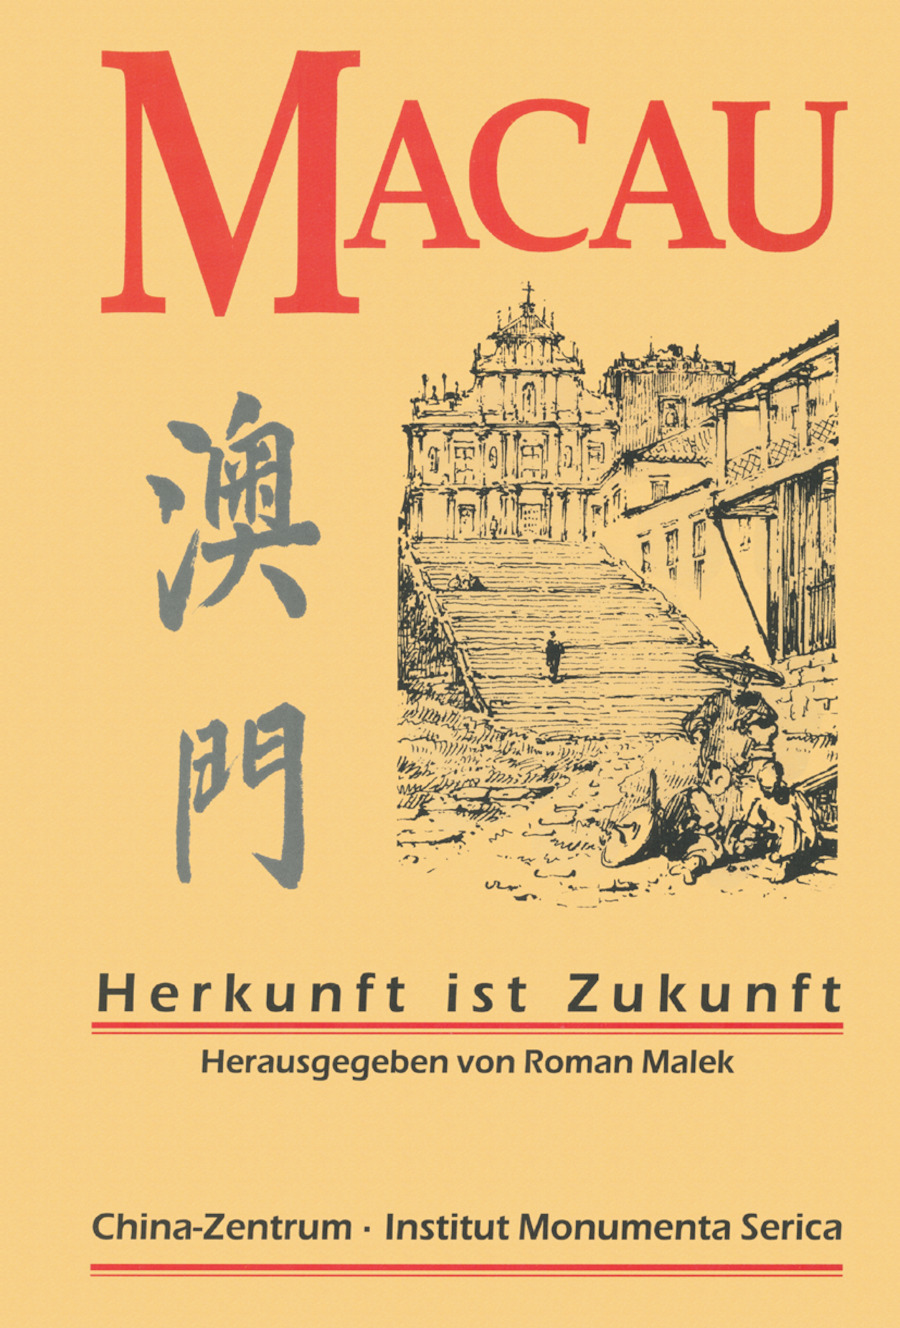 Macau: Herkunft ist Zukunft book cover